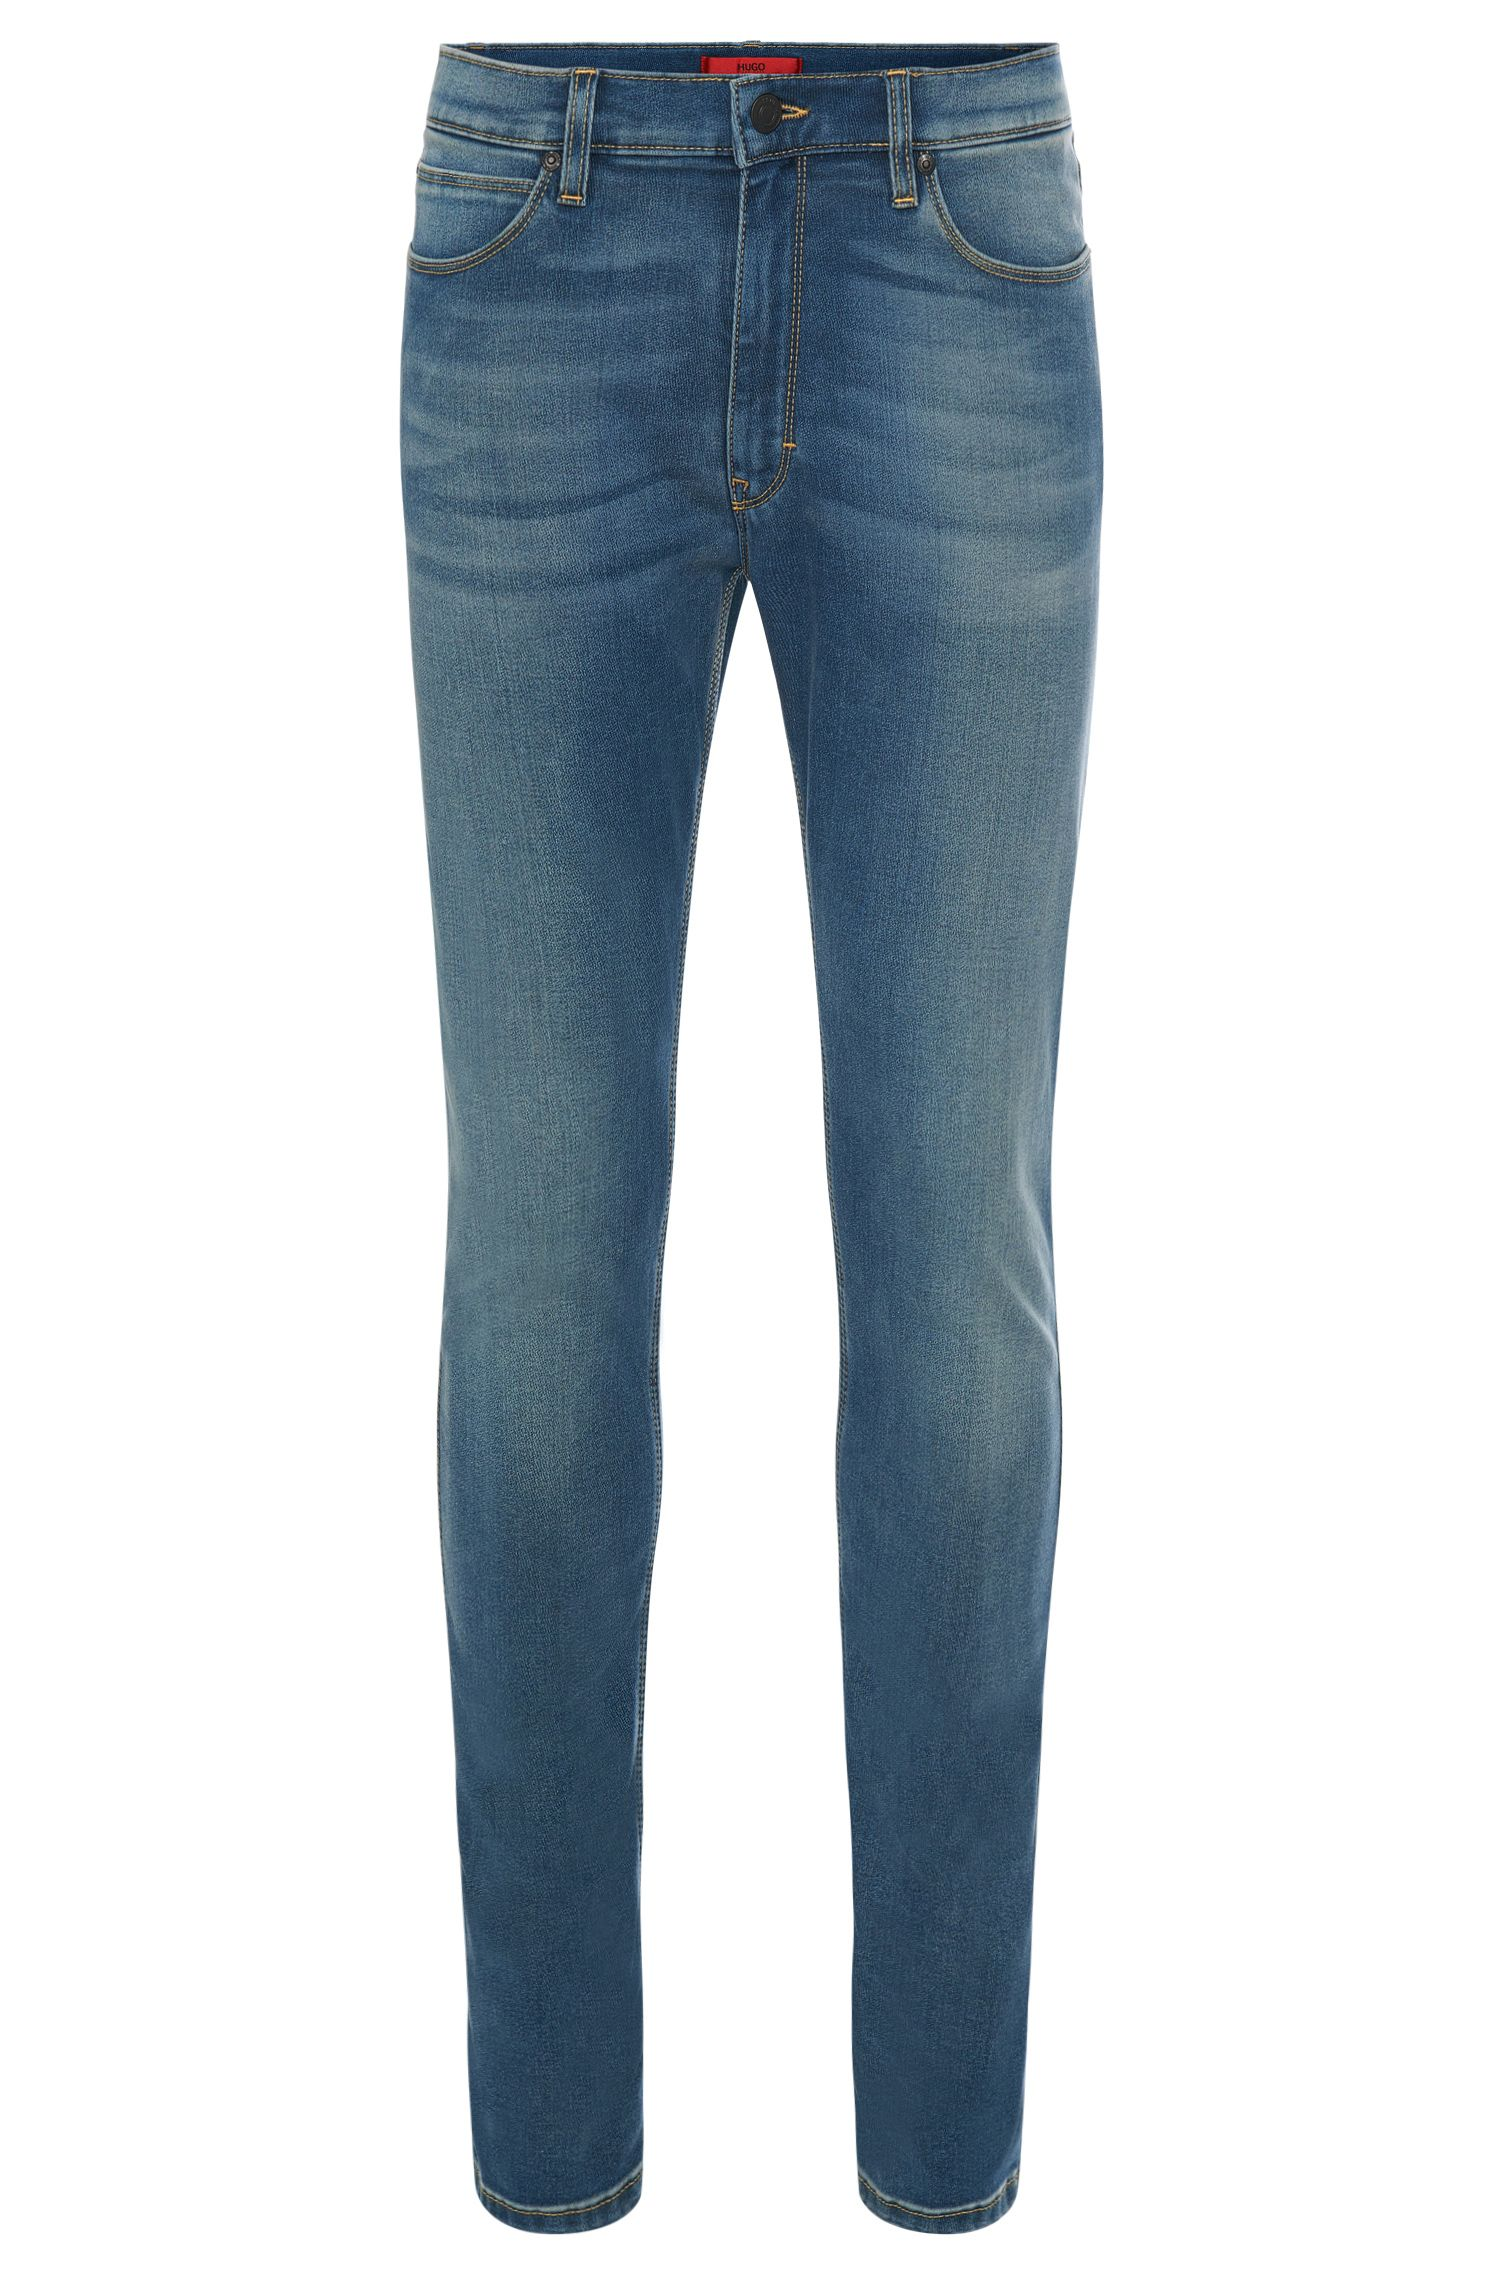 11.75 oz Stretch Cotton Blend Jeans, Skinny FIt | Hugo 734